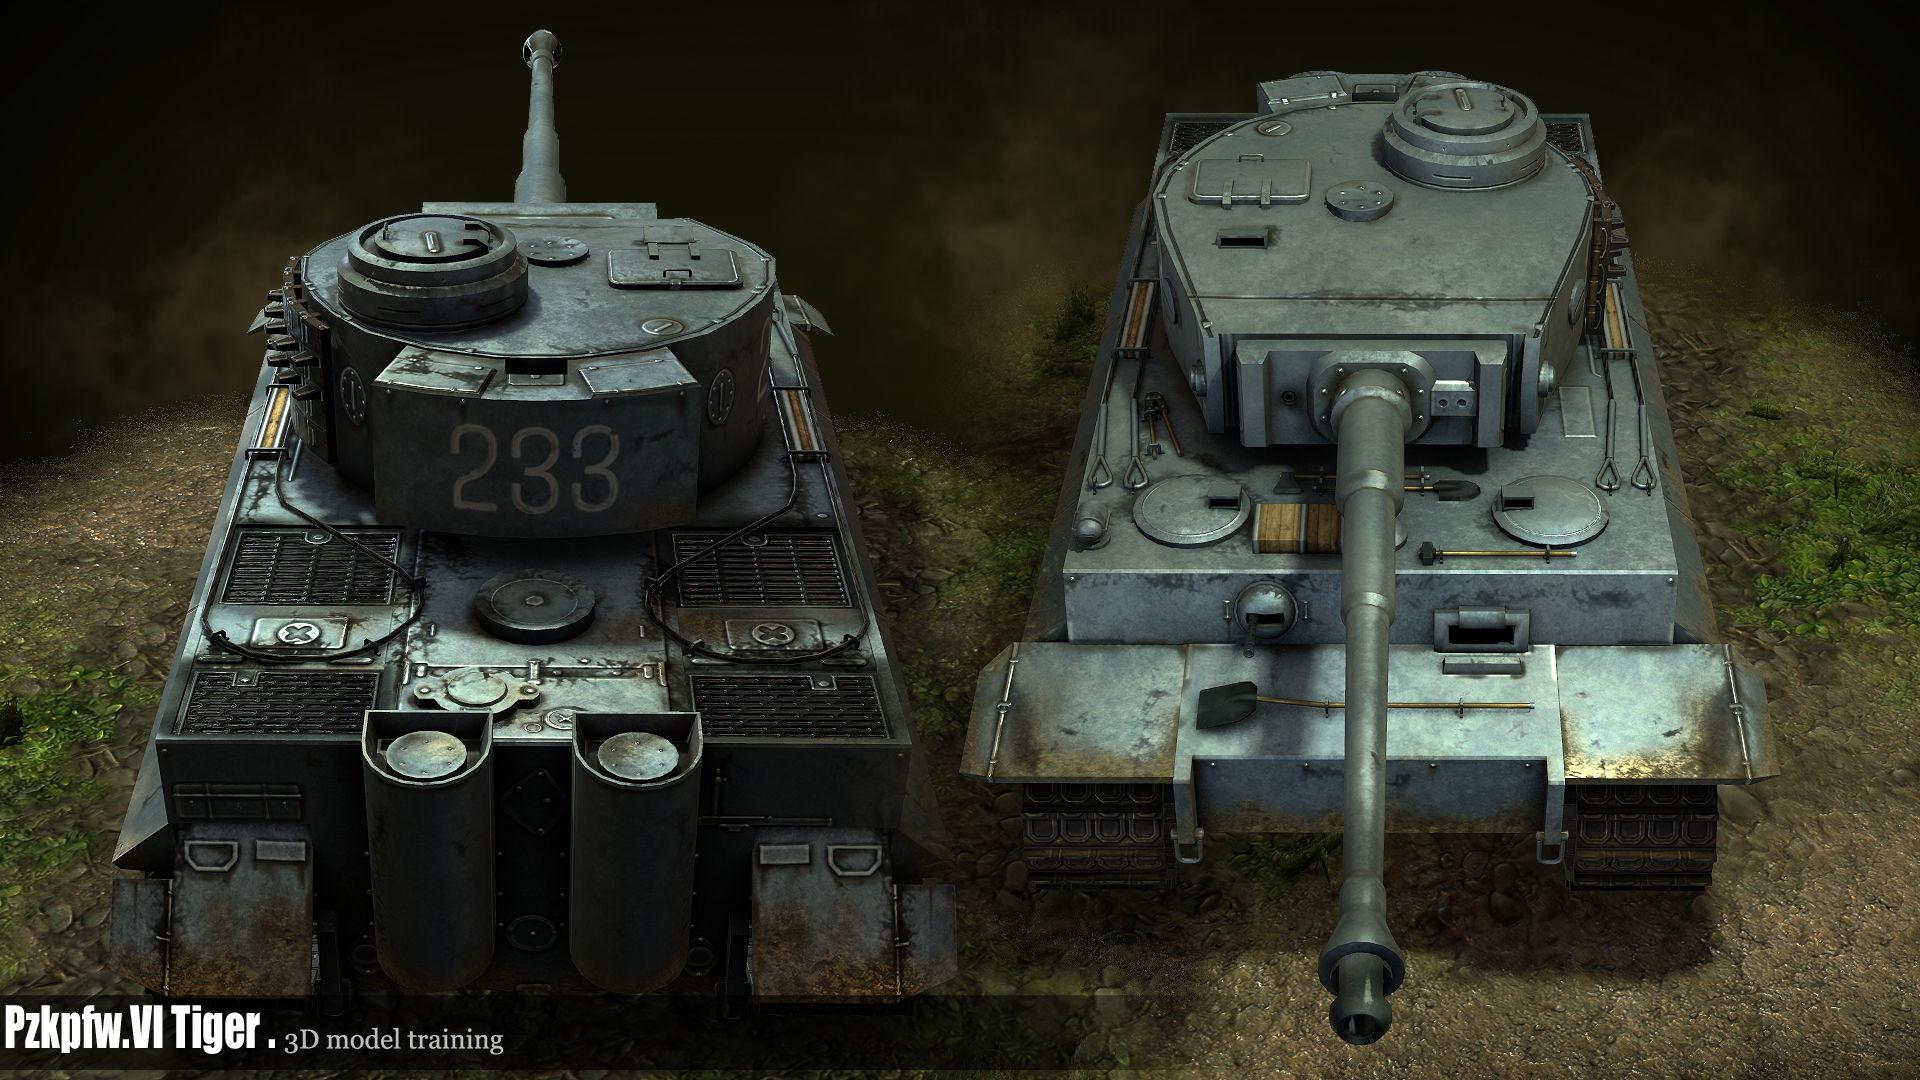 ArtStation - Pzkpfw VI Tiger tank, lin xin